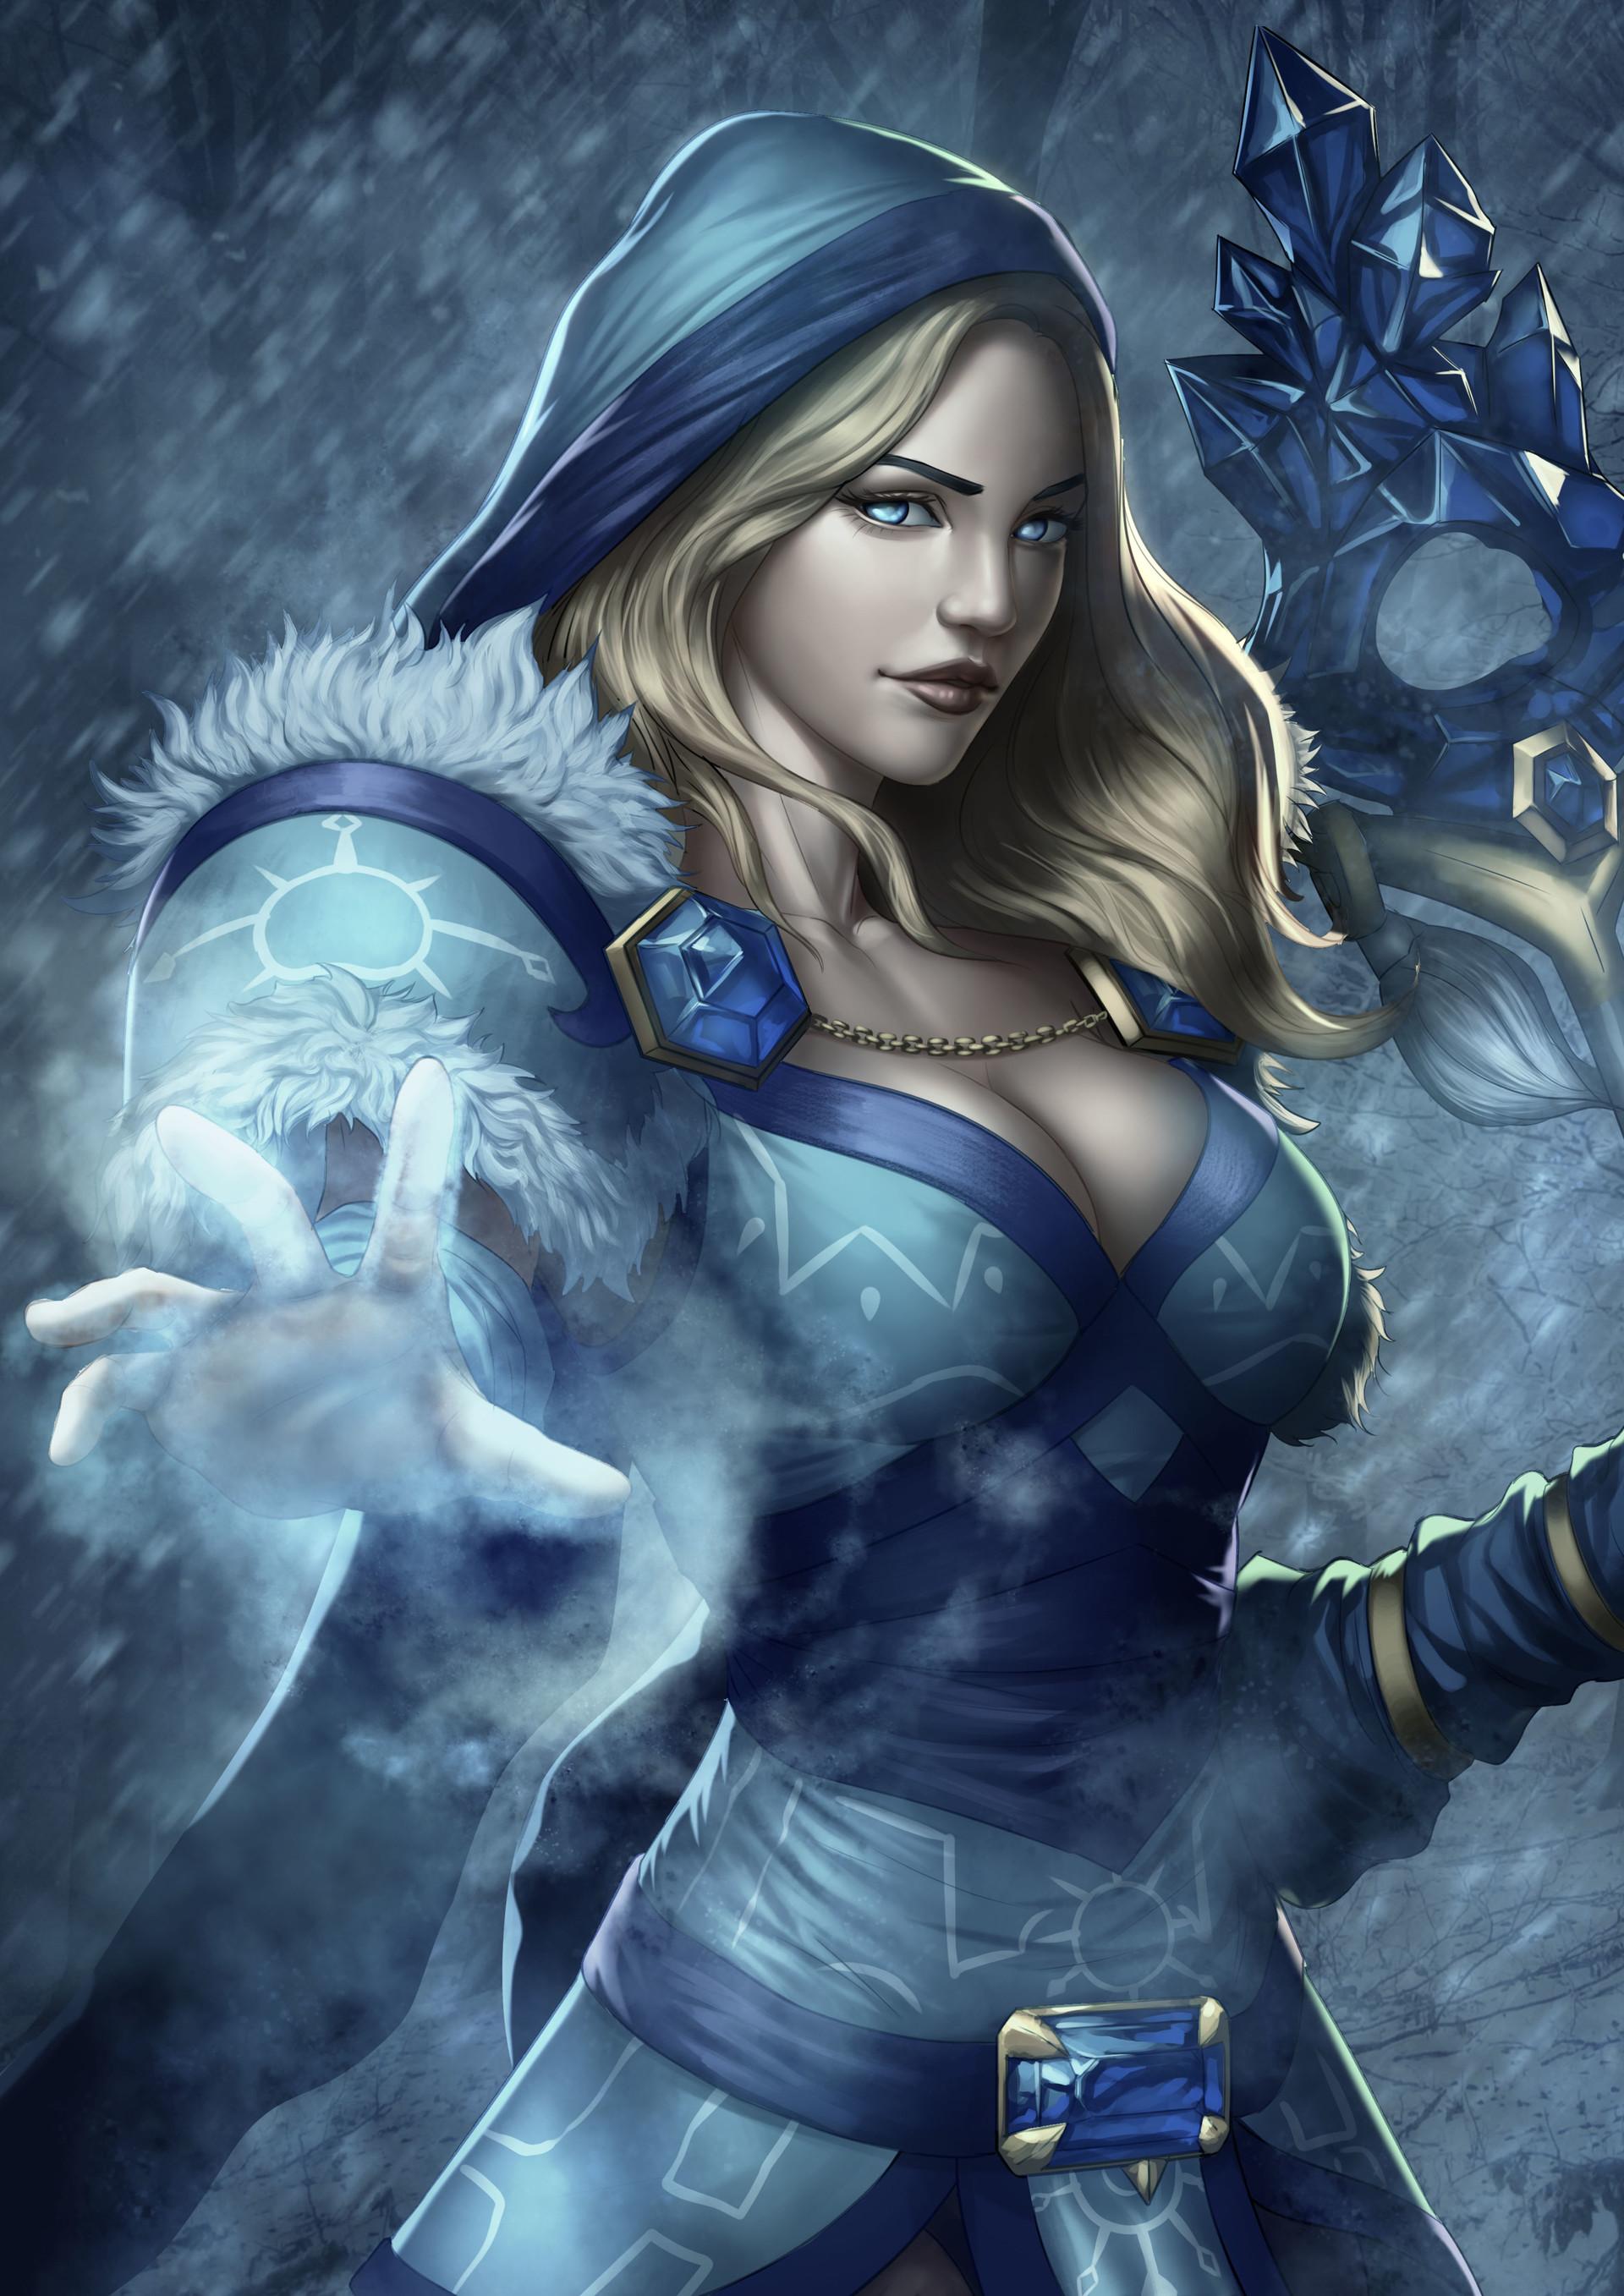 chris koh crystal maiden